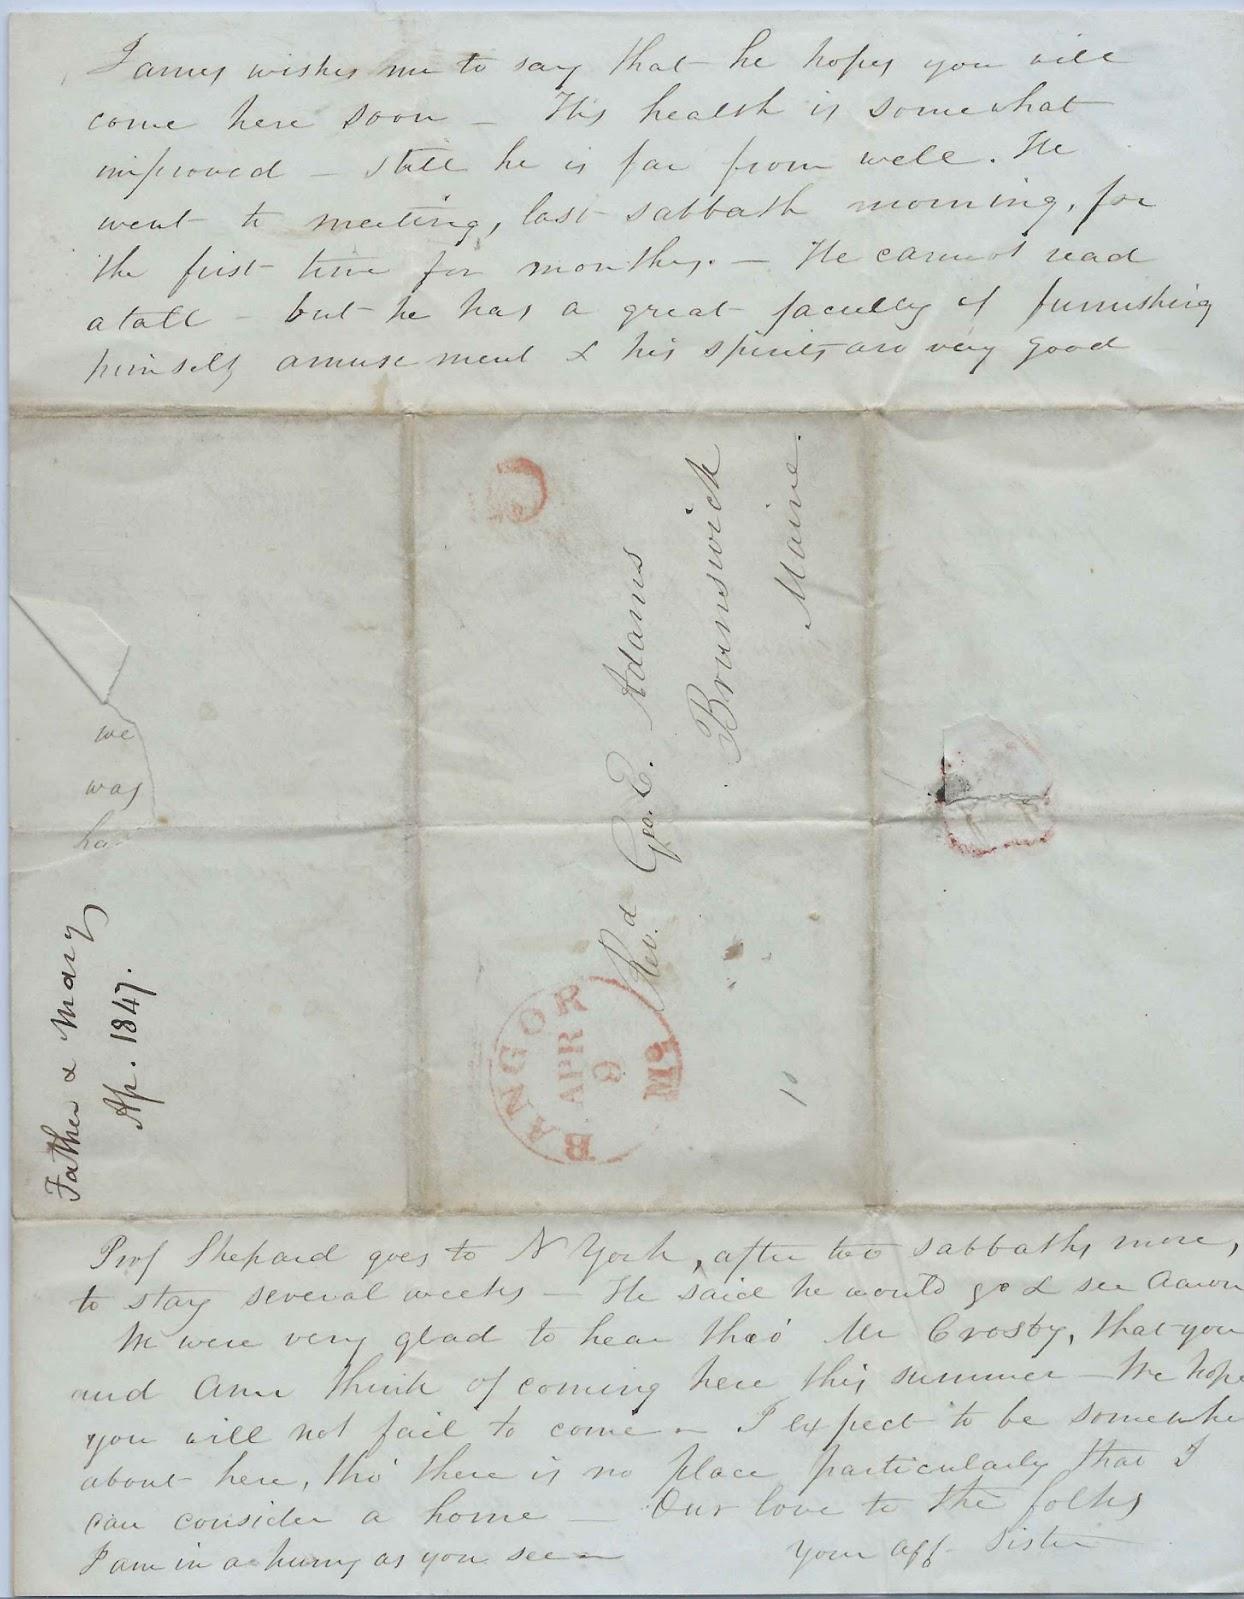 Heirlooms Reunited: 1847 Letter from Deacon Eliashib Adams